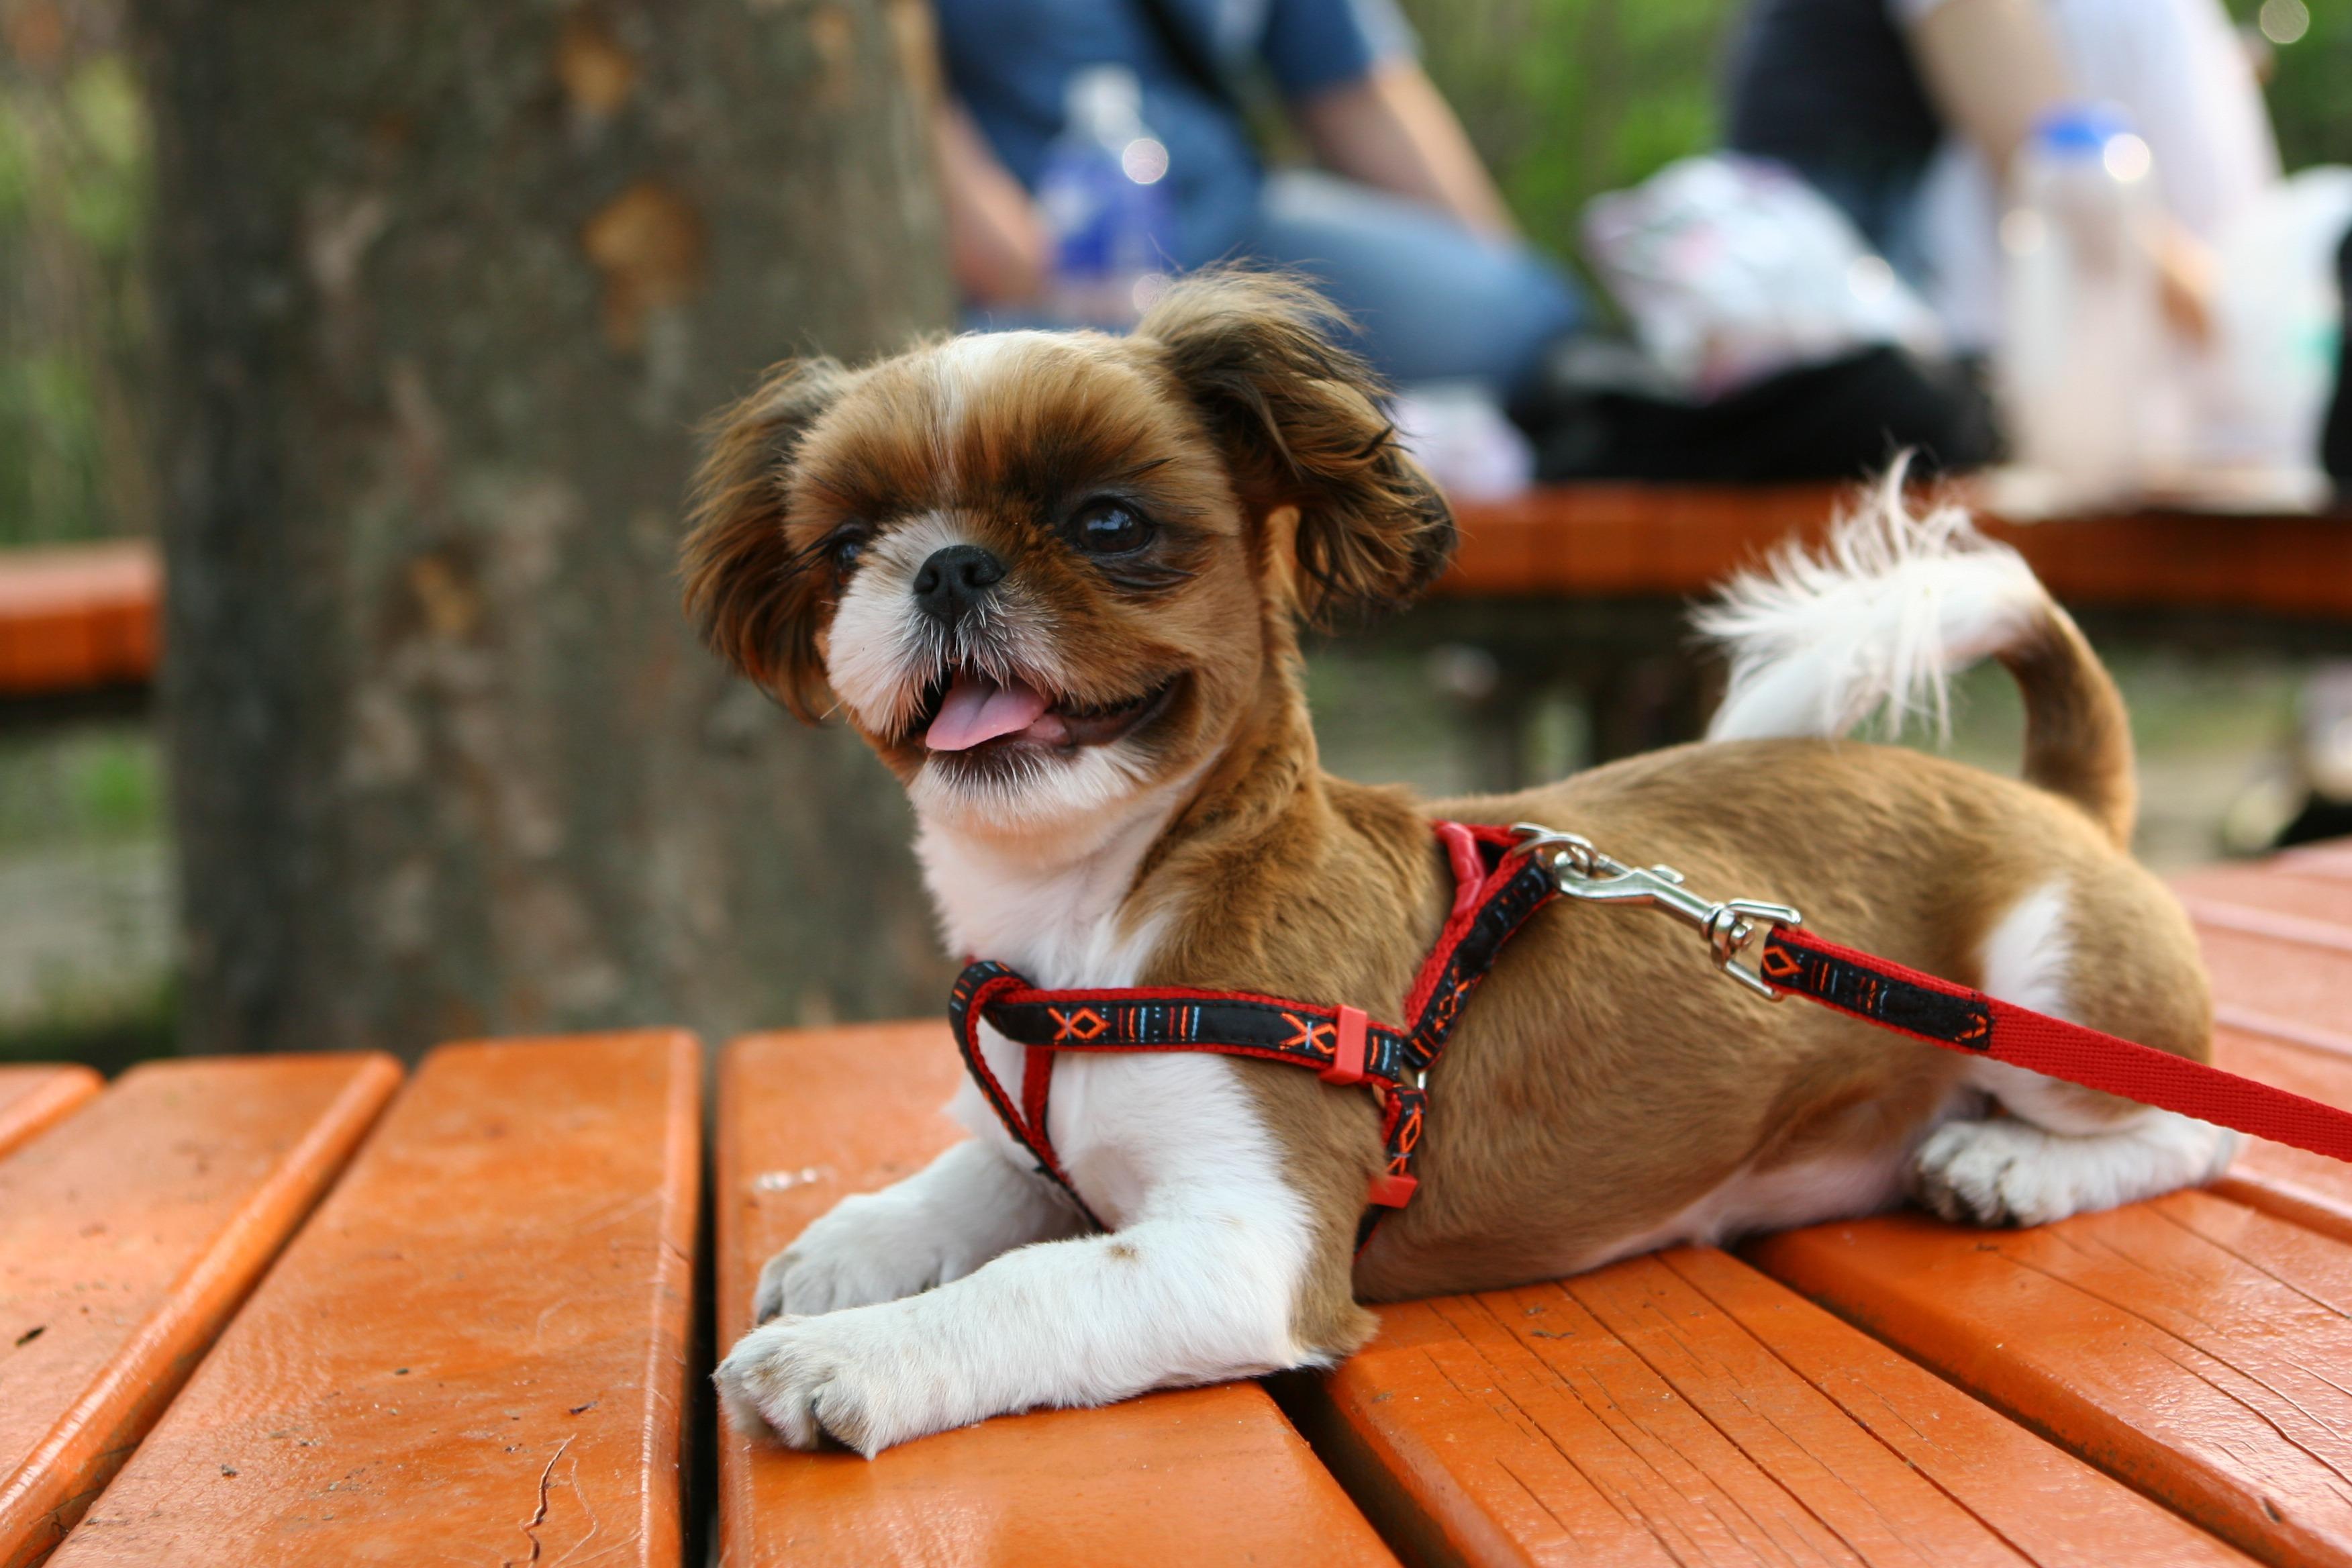 Gambar anak anjing berjalan taman binatang menyusui kacamata #6: puppy dog walk park mammal glasses vertebrate dog like mammal